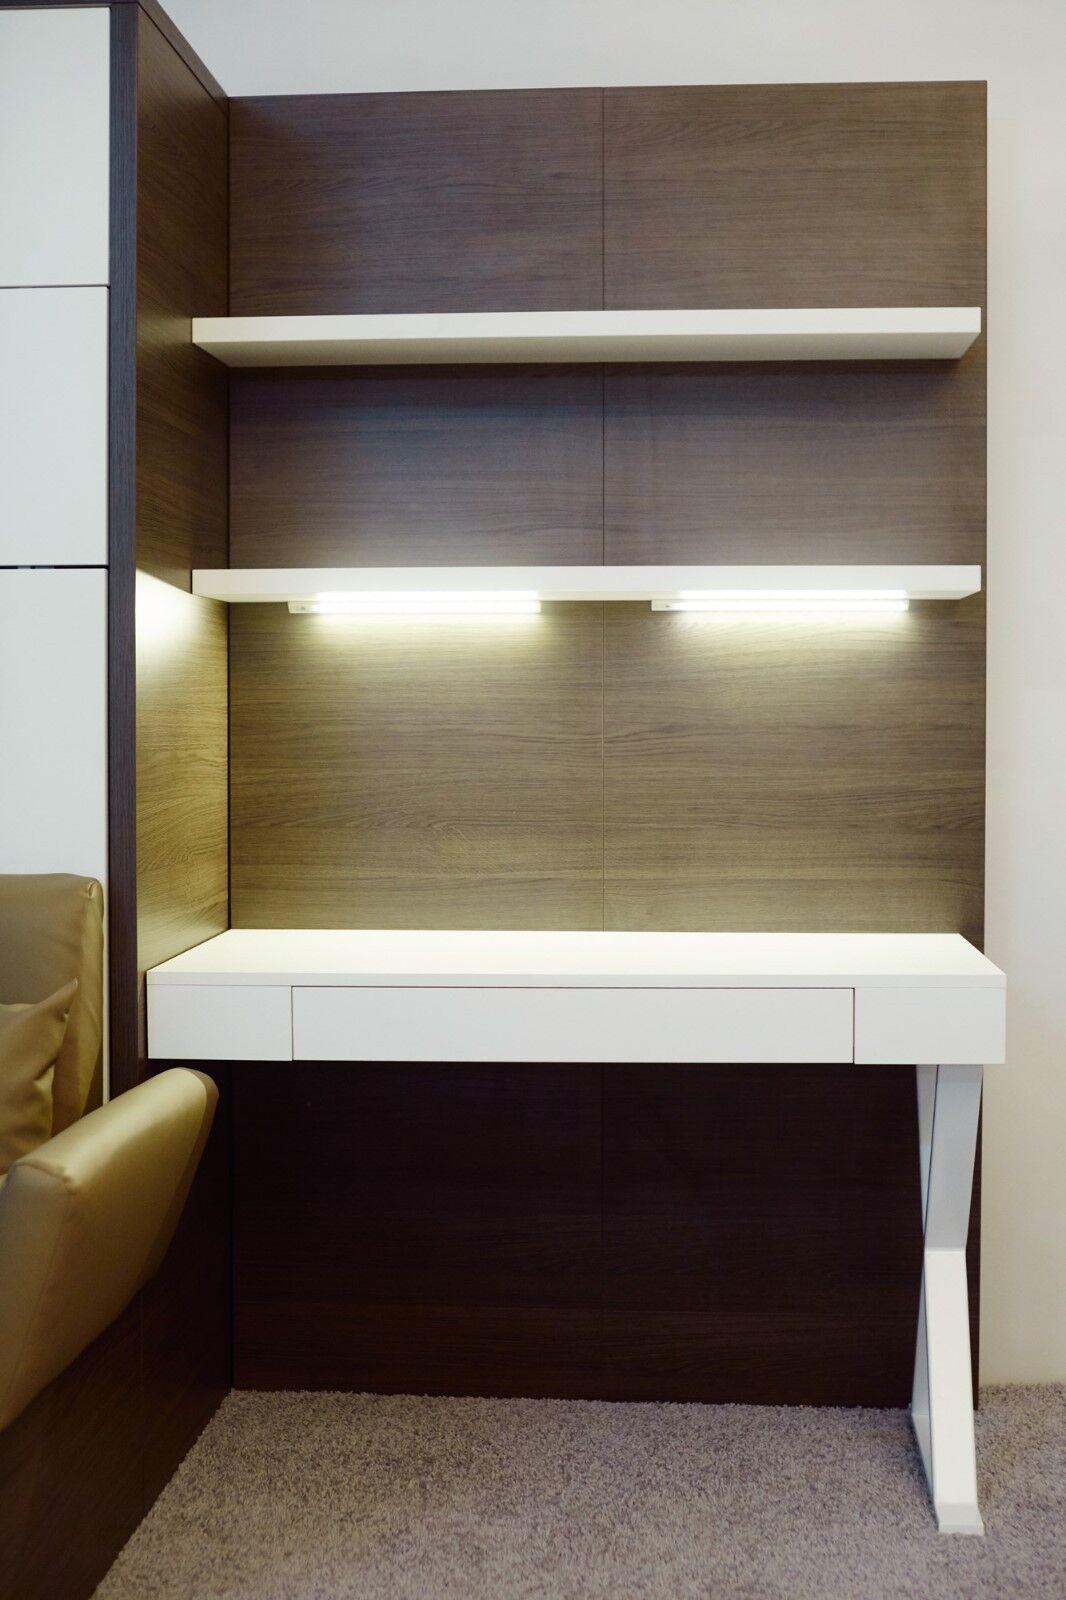 schrankbett wandbett klappbett sofa wbs 1 soft 140 x 200 cm anthrazit wei eur. Black Bedroom Furniture Sets. Home Design Ideas